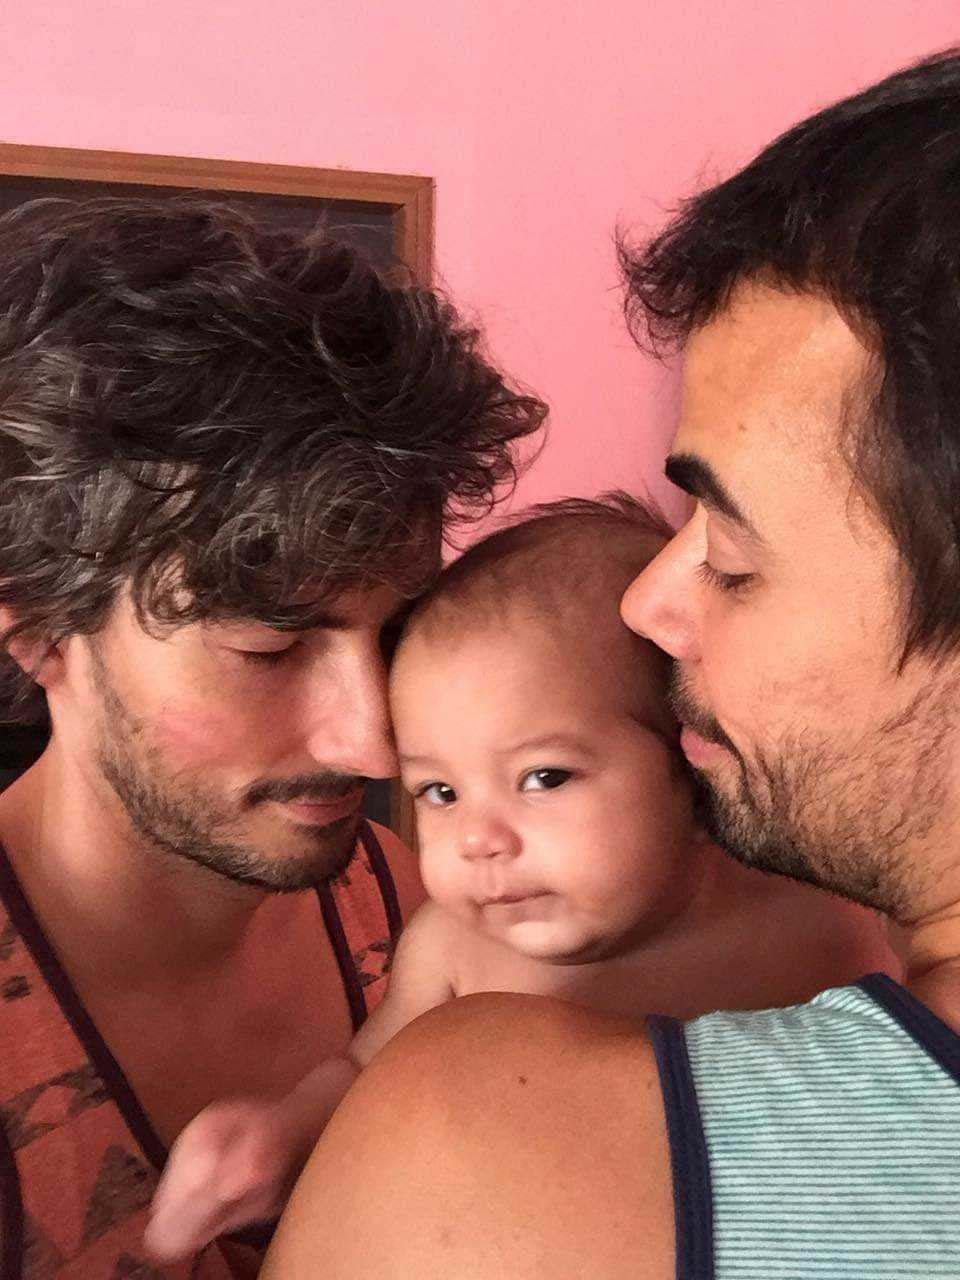 pais gays beijam filho adotivo